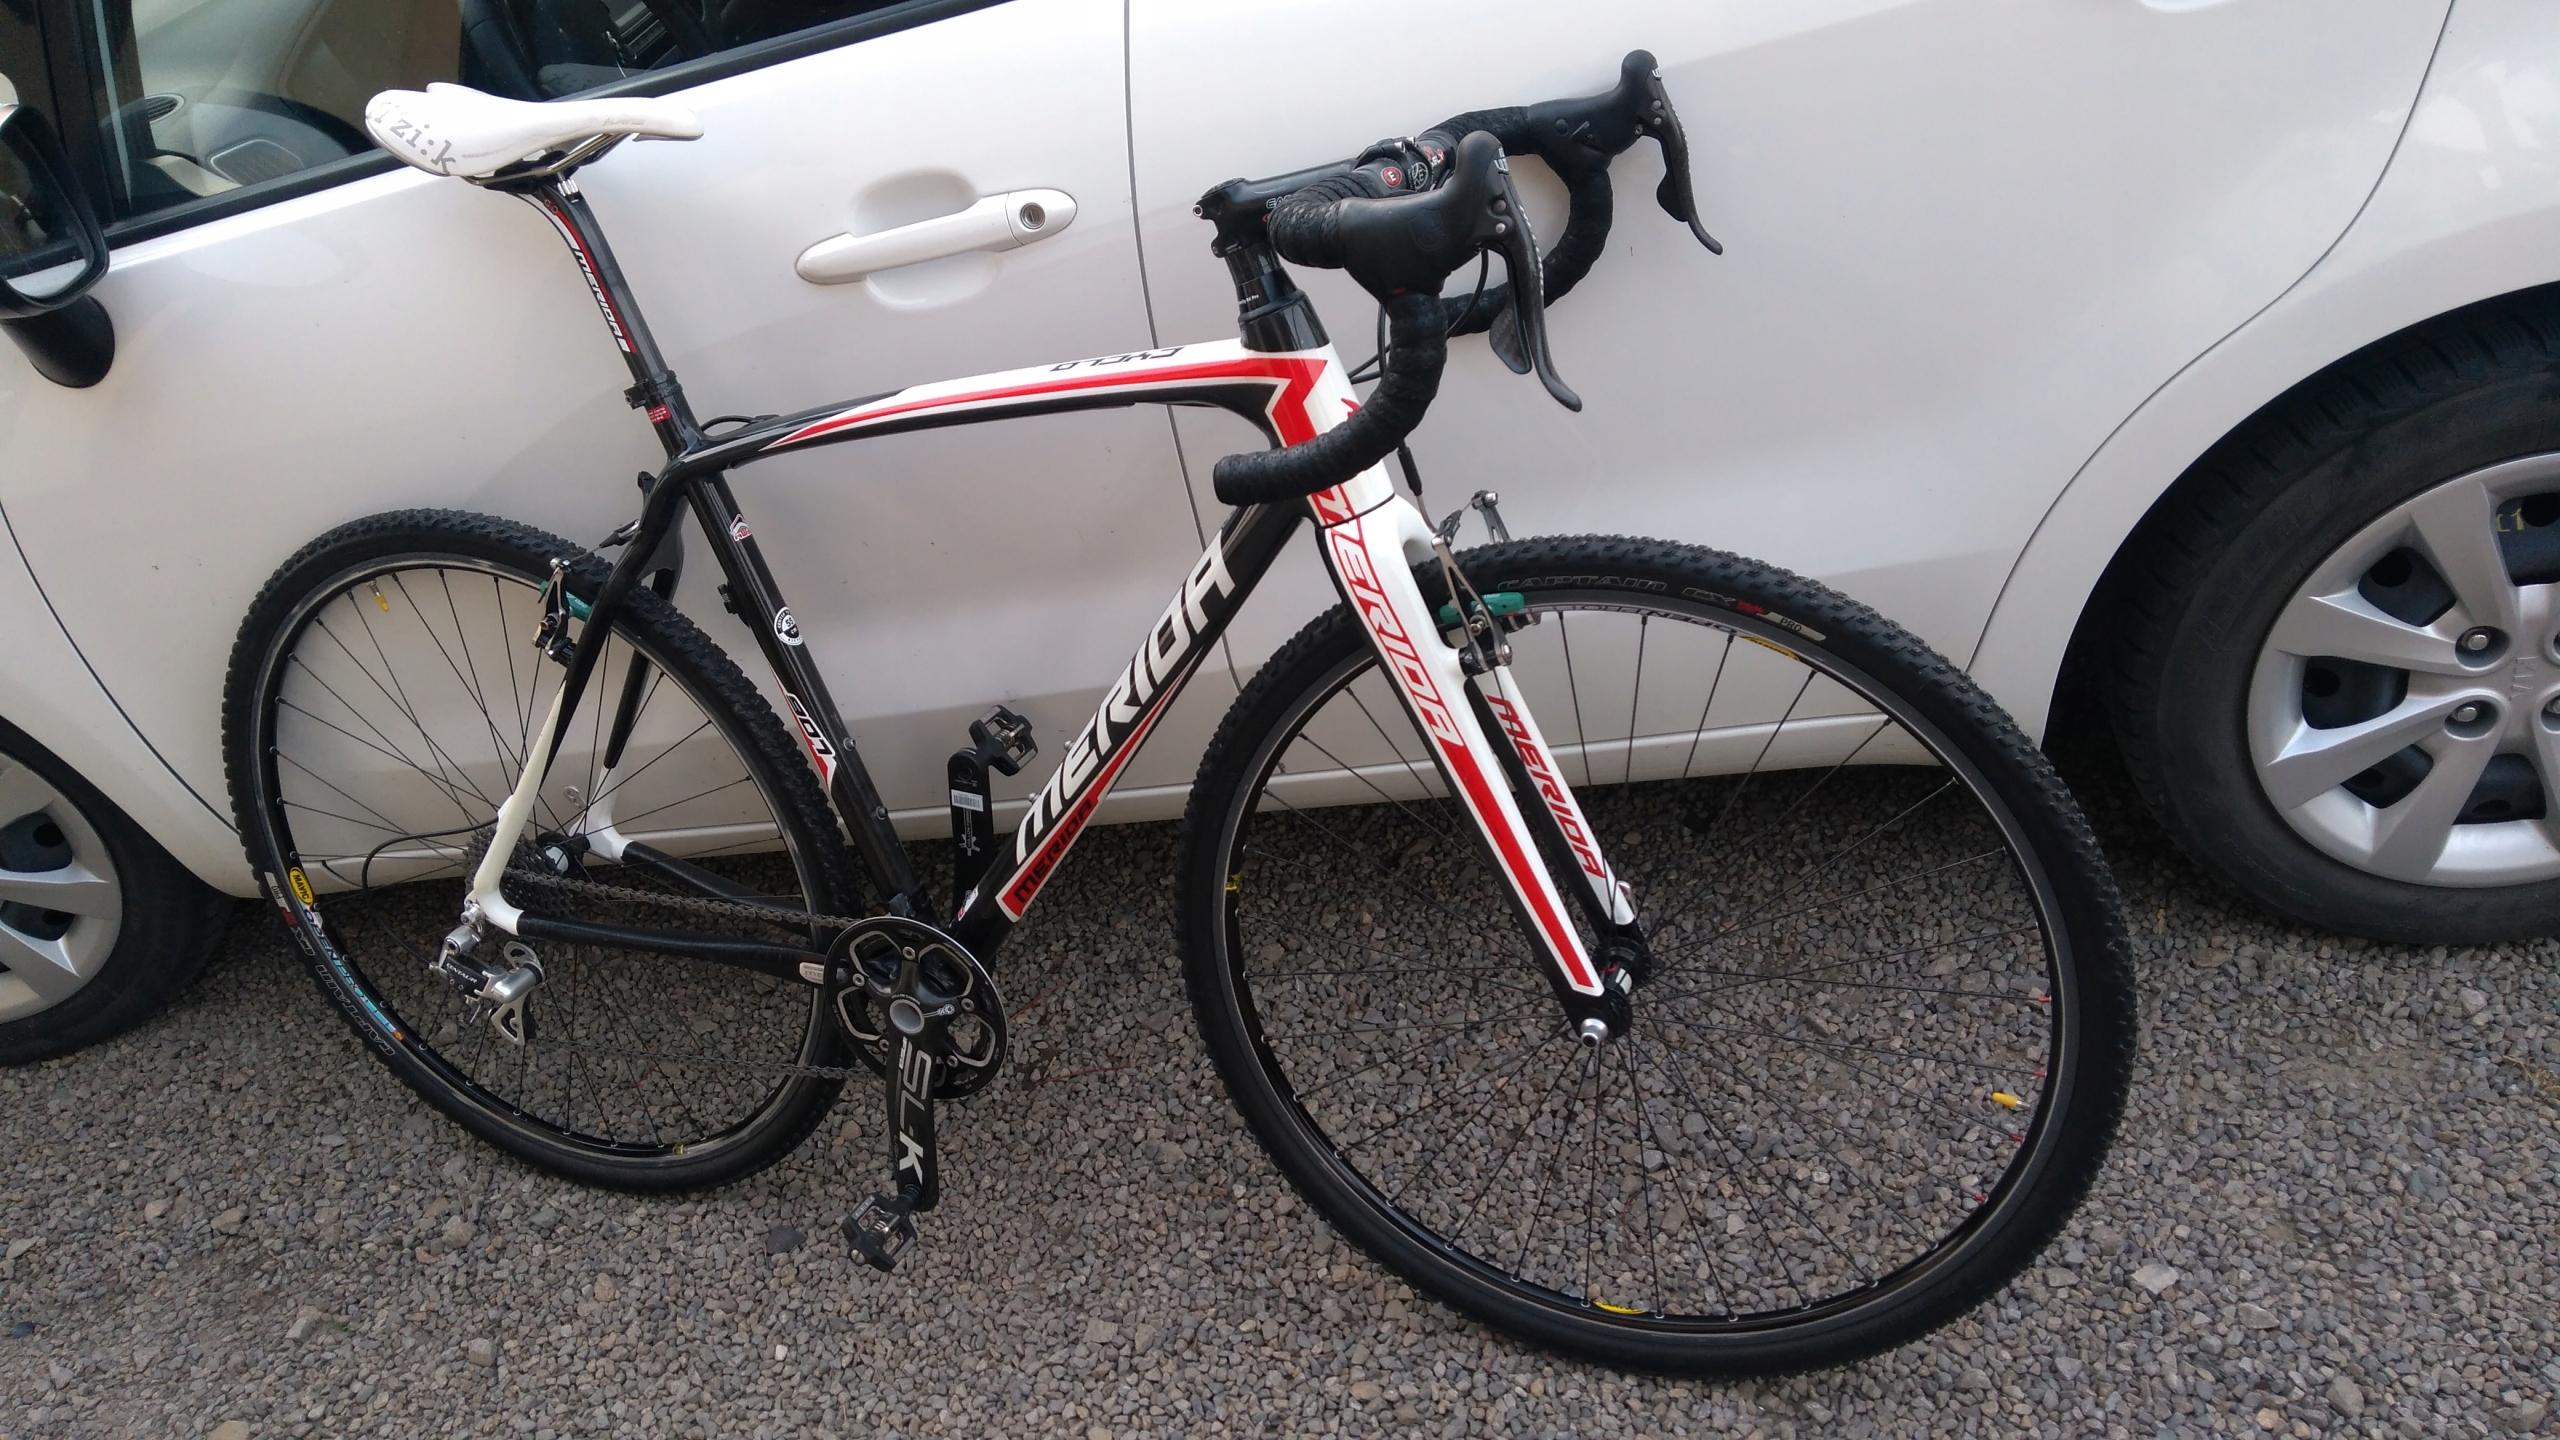 Merida cyclocross CF 907 CARBON 55 cm - przełaj